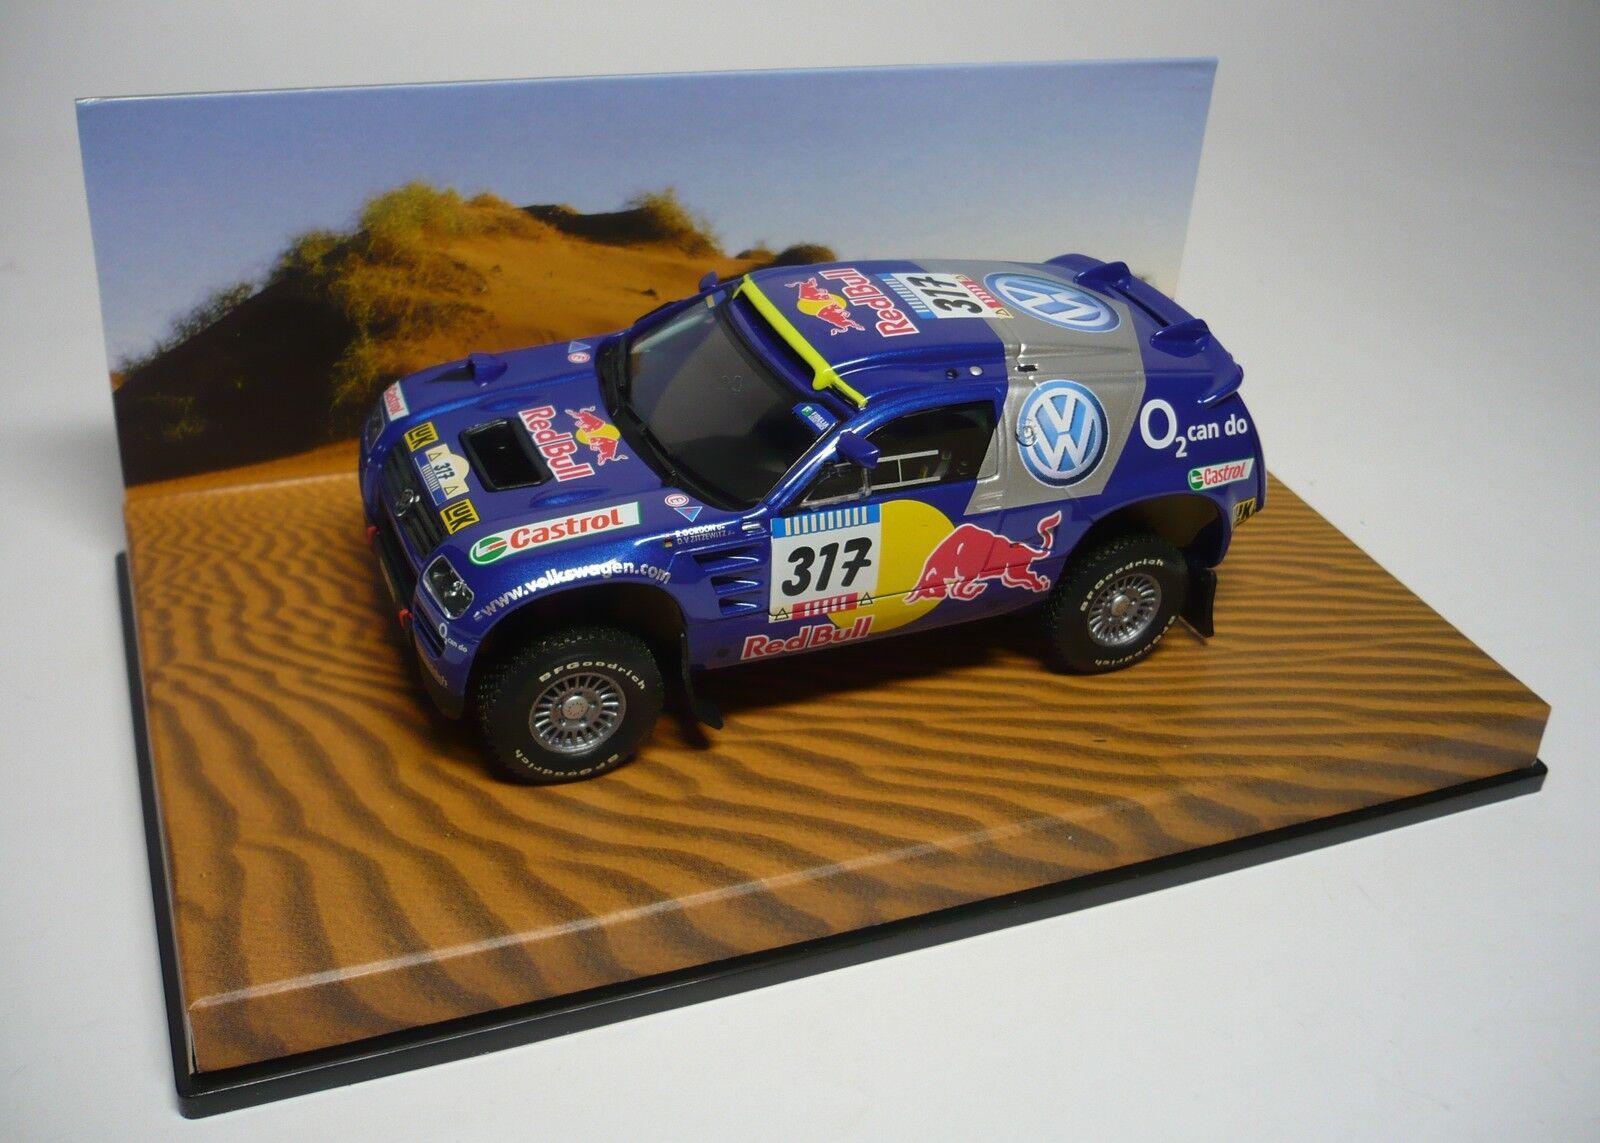 VW RACE TOUAREG  317 PARIS DAKAR 2005 1 43 43 43 MINICHAMPS f046f5